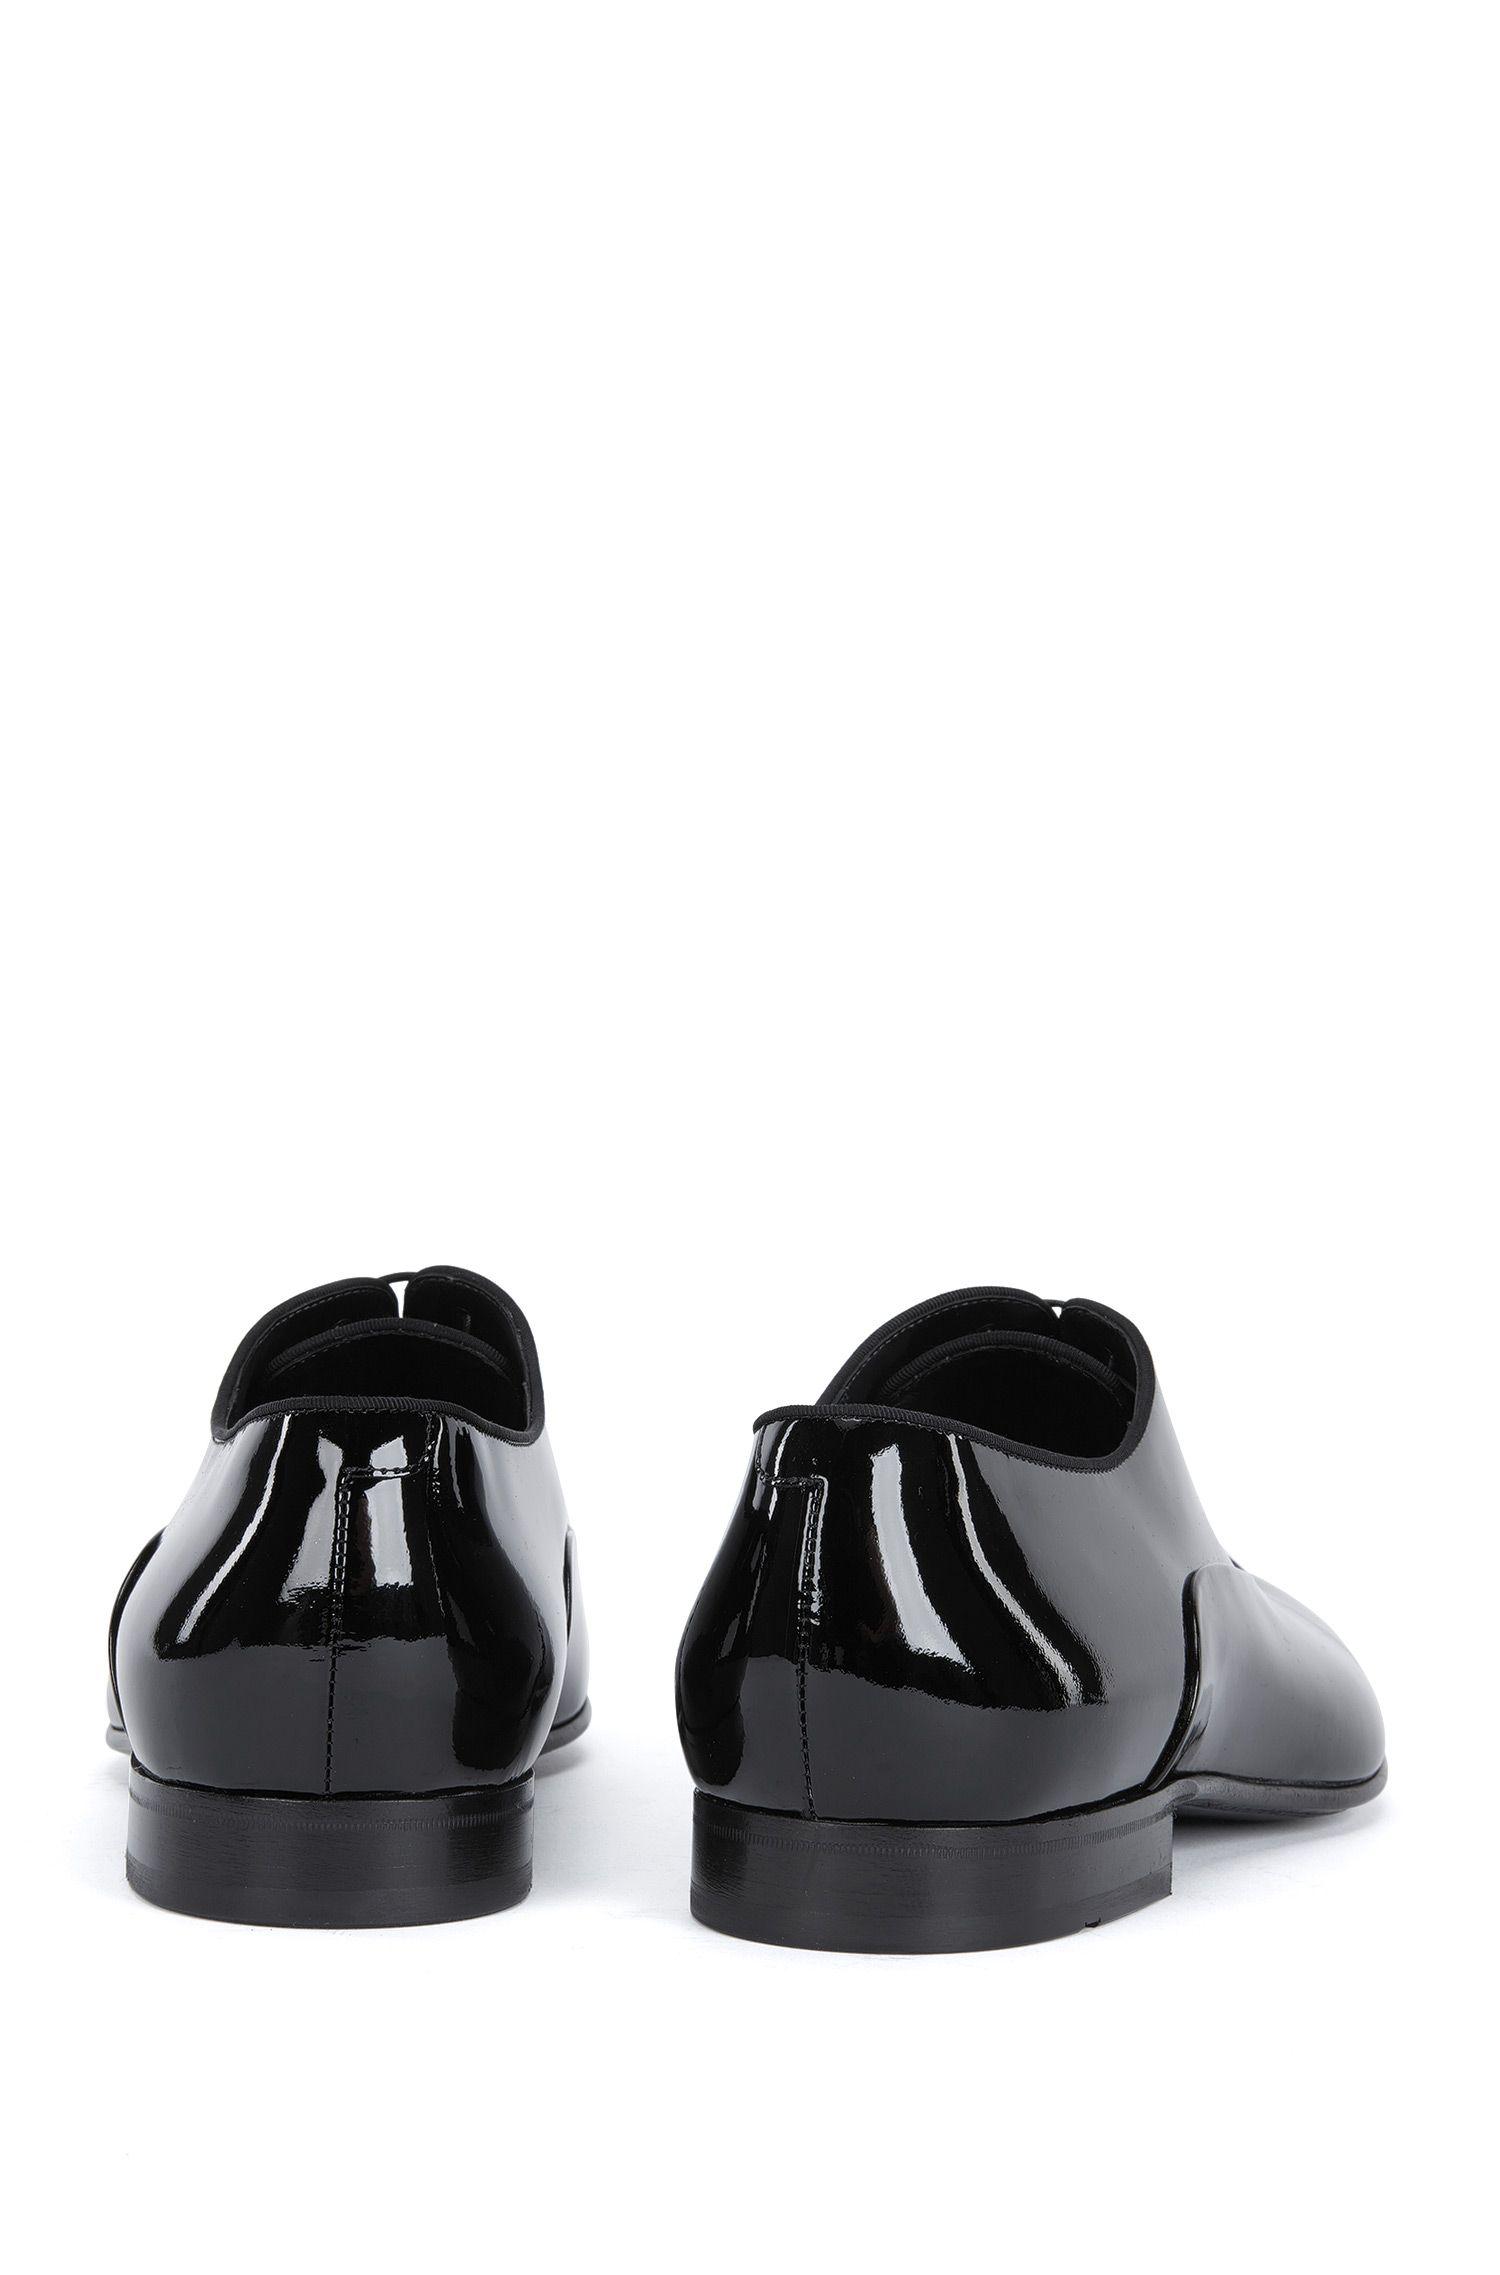 BOSS Hugo Boss Italian Patent Leather Oxford Evening Shoe Evening Oxfr pa 11.5 Black